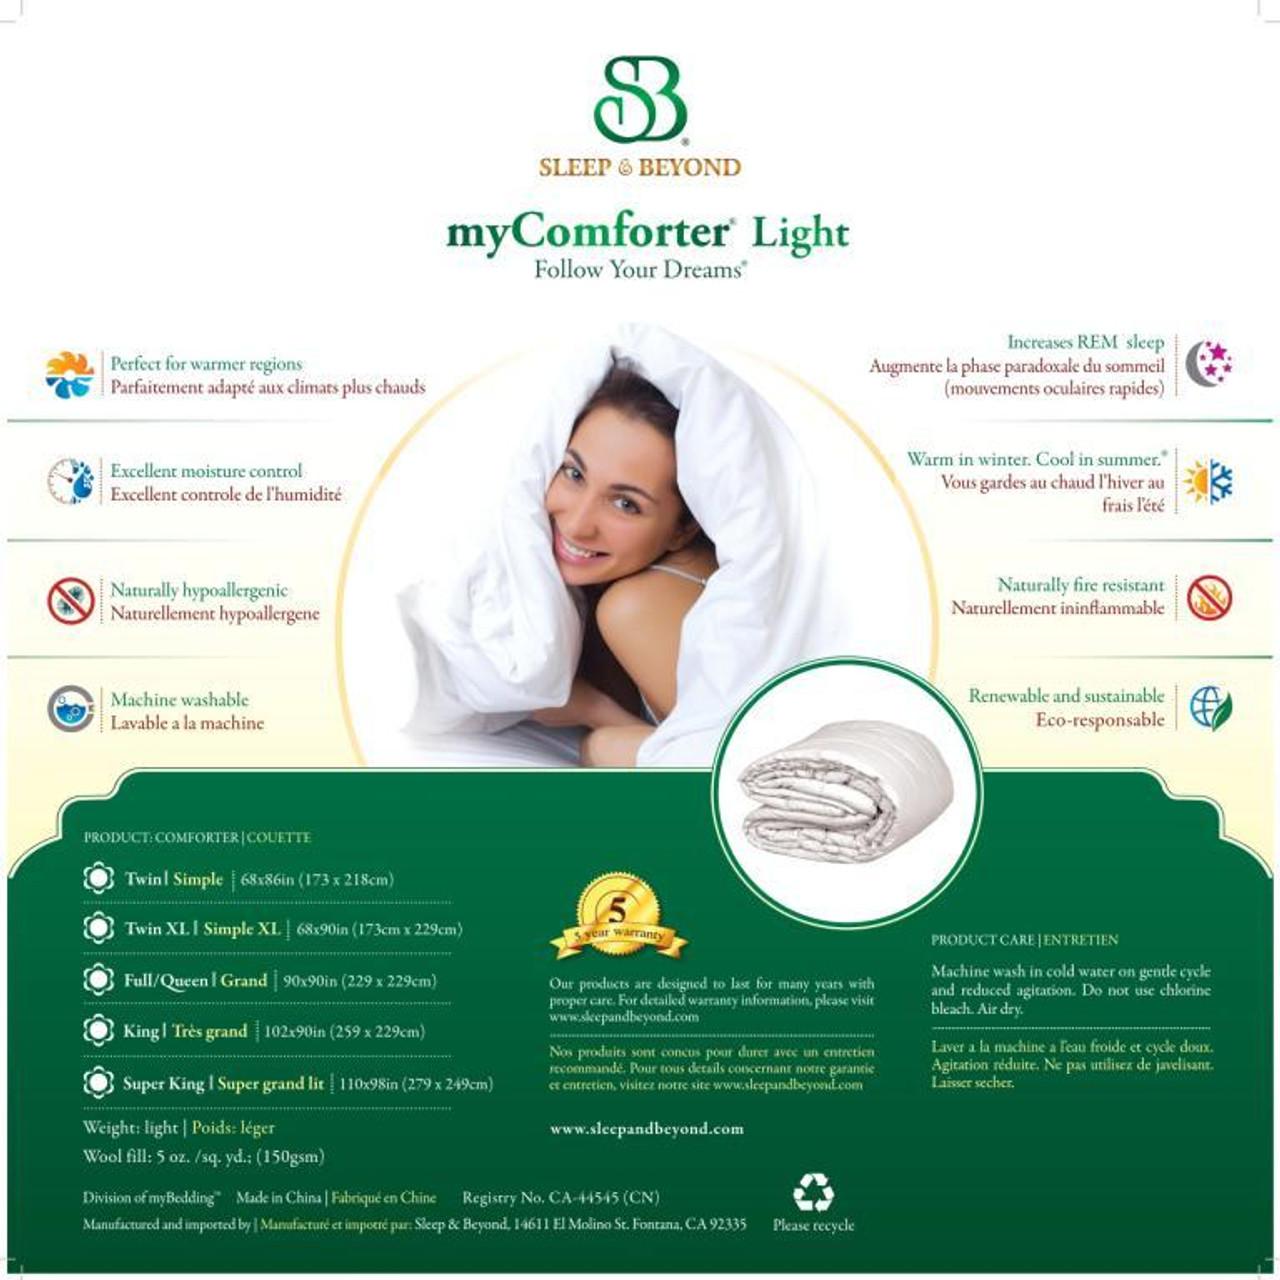 Sleep & Beyond myComforter Light 100% Washable Wool Comforter Package Detail